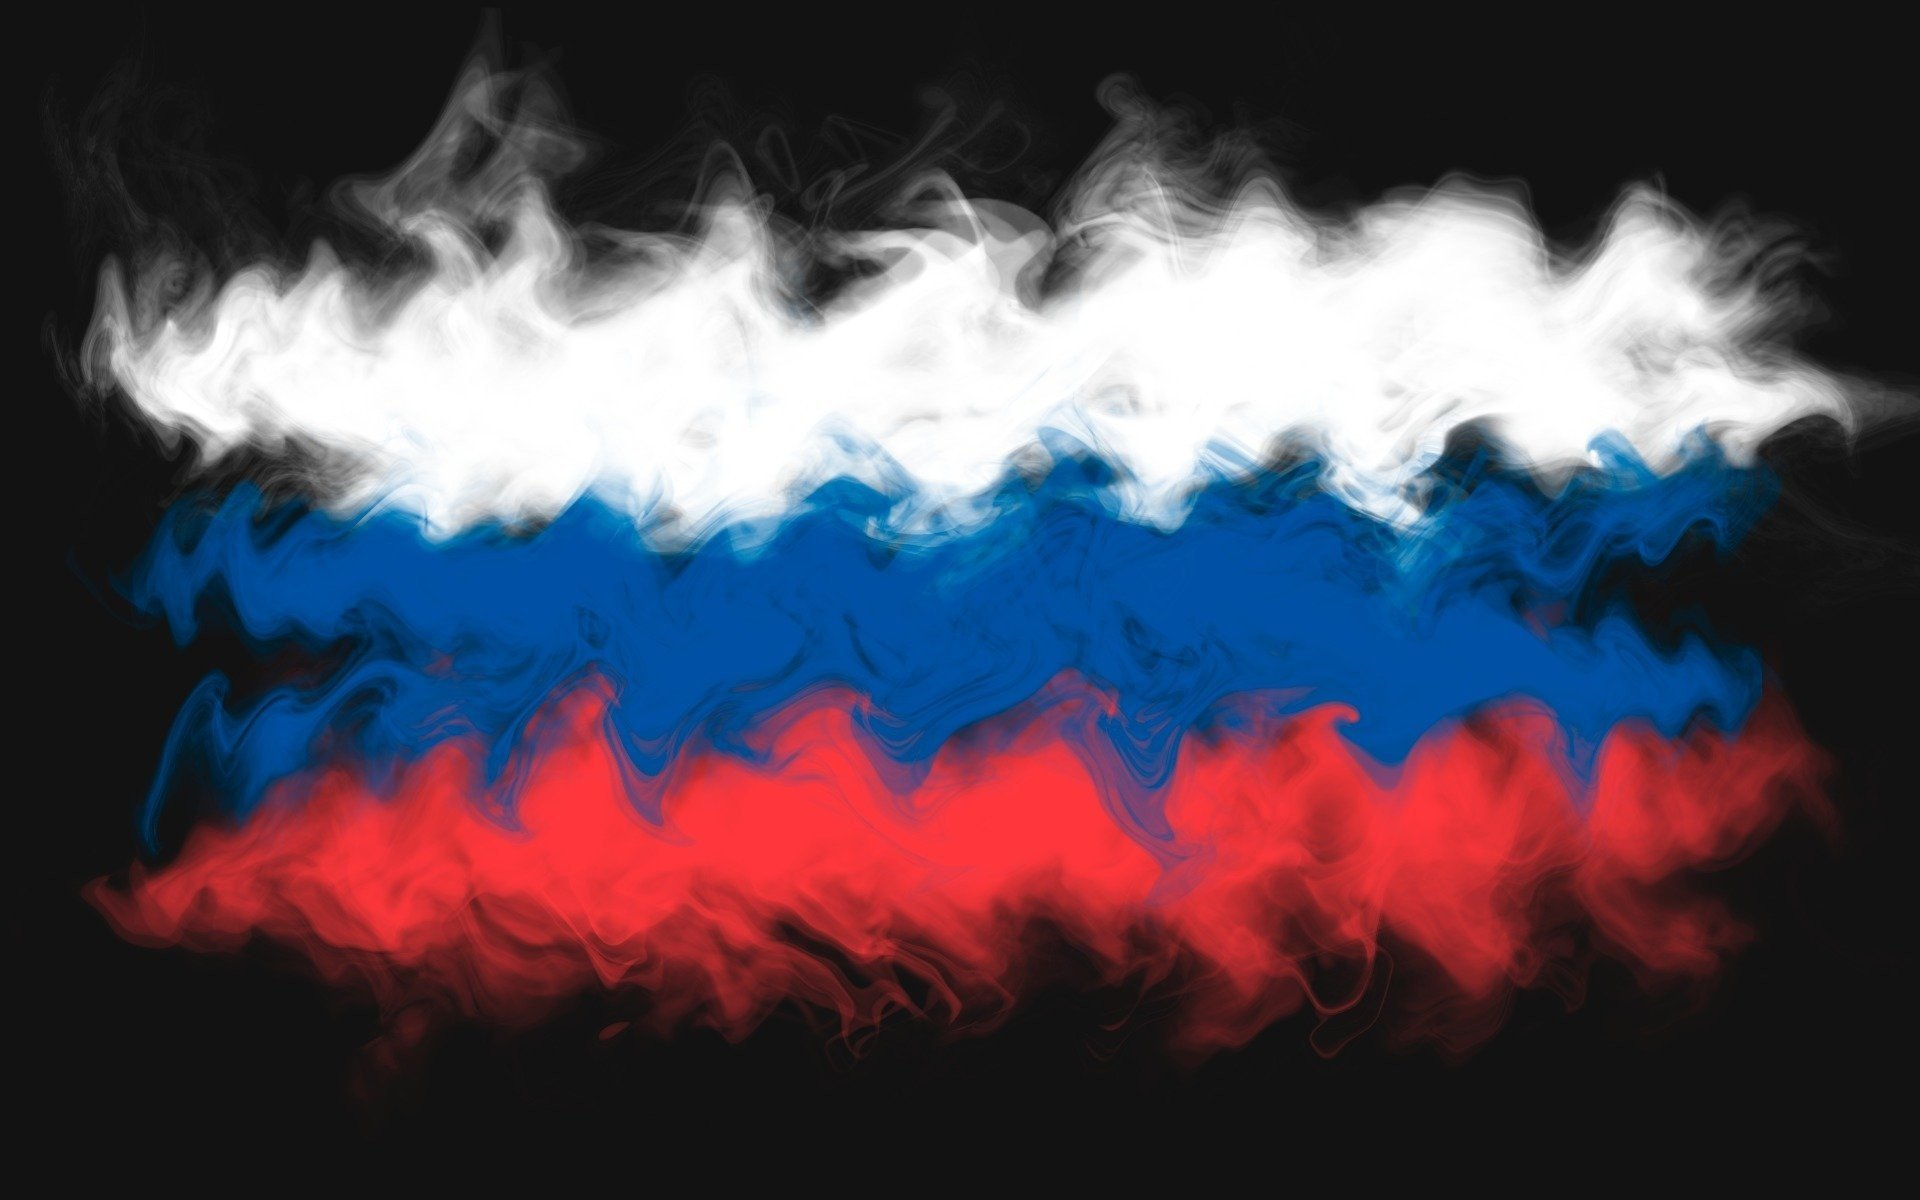 фон на фото в виде флага рф медицинские центры октябрьской